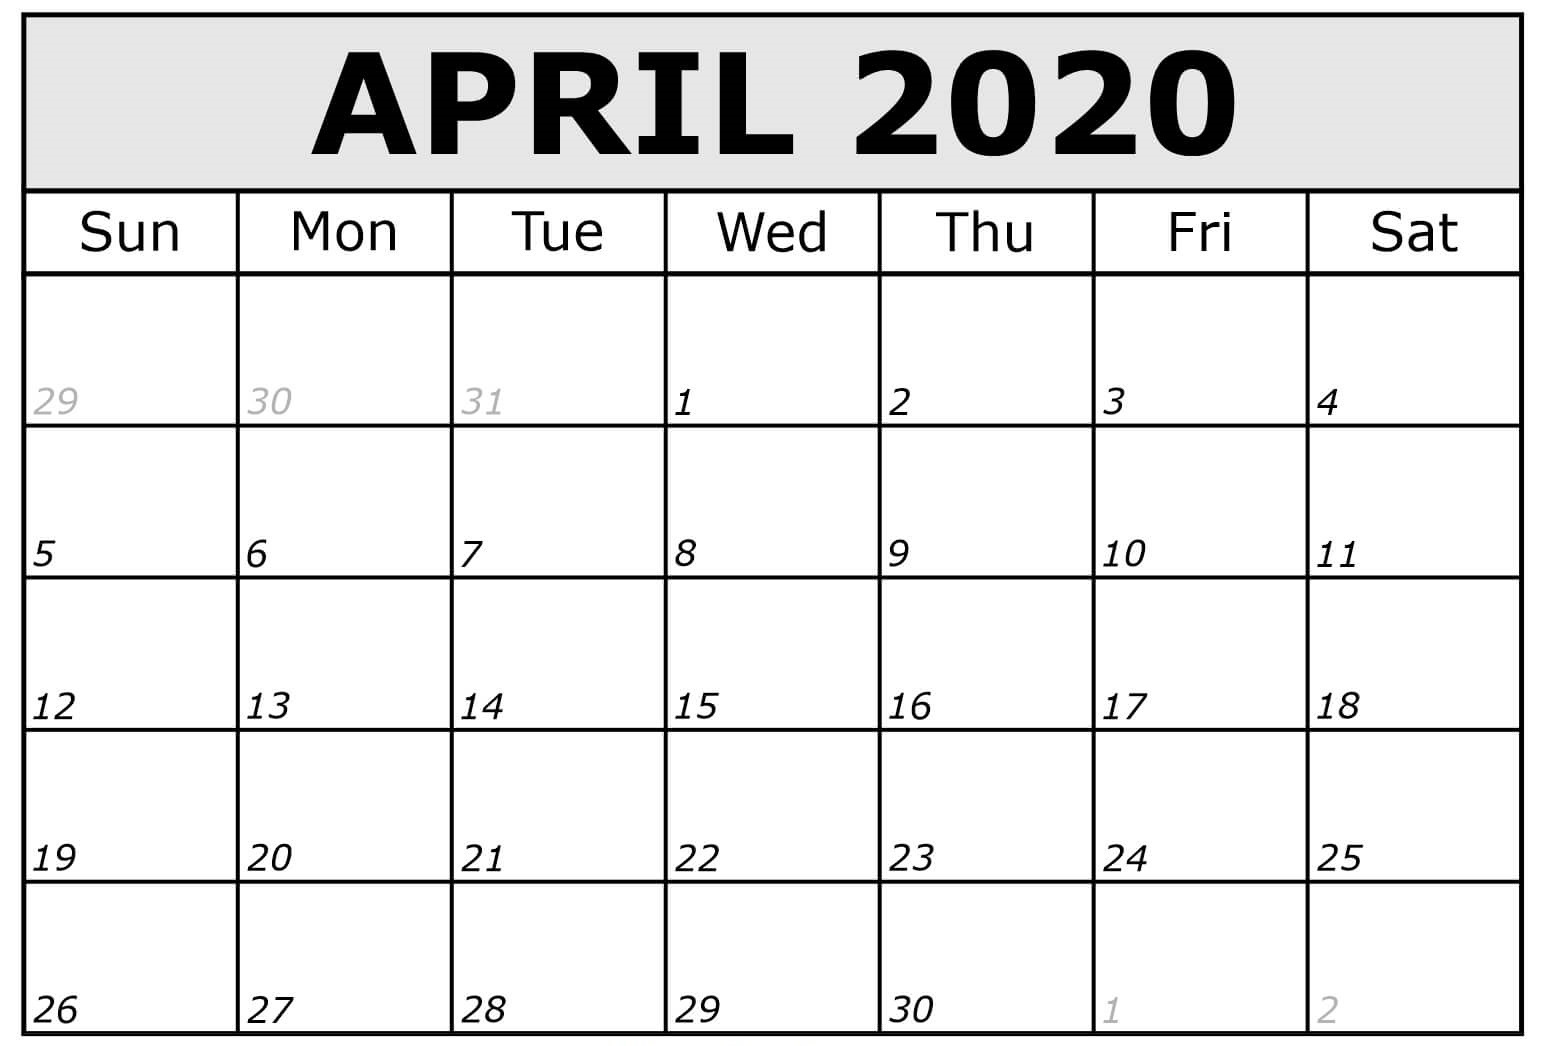 April 2020 Calendar Canada With Holidays